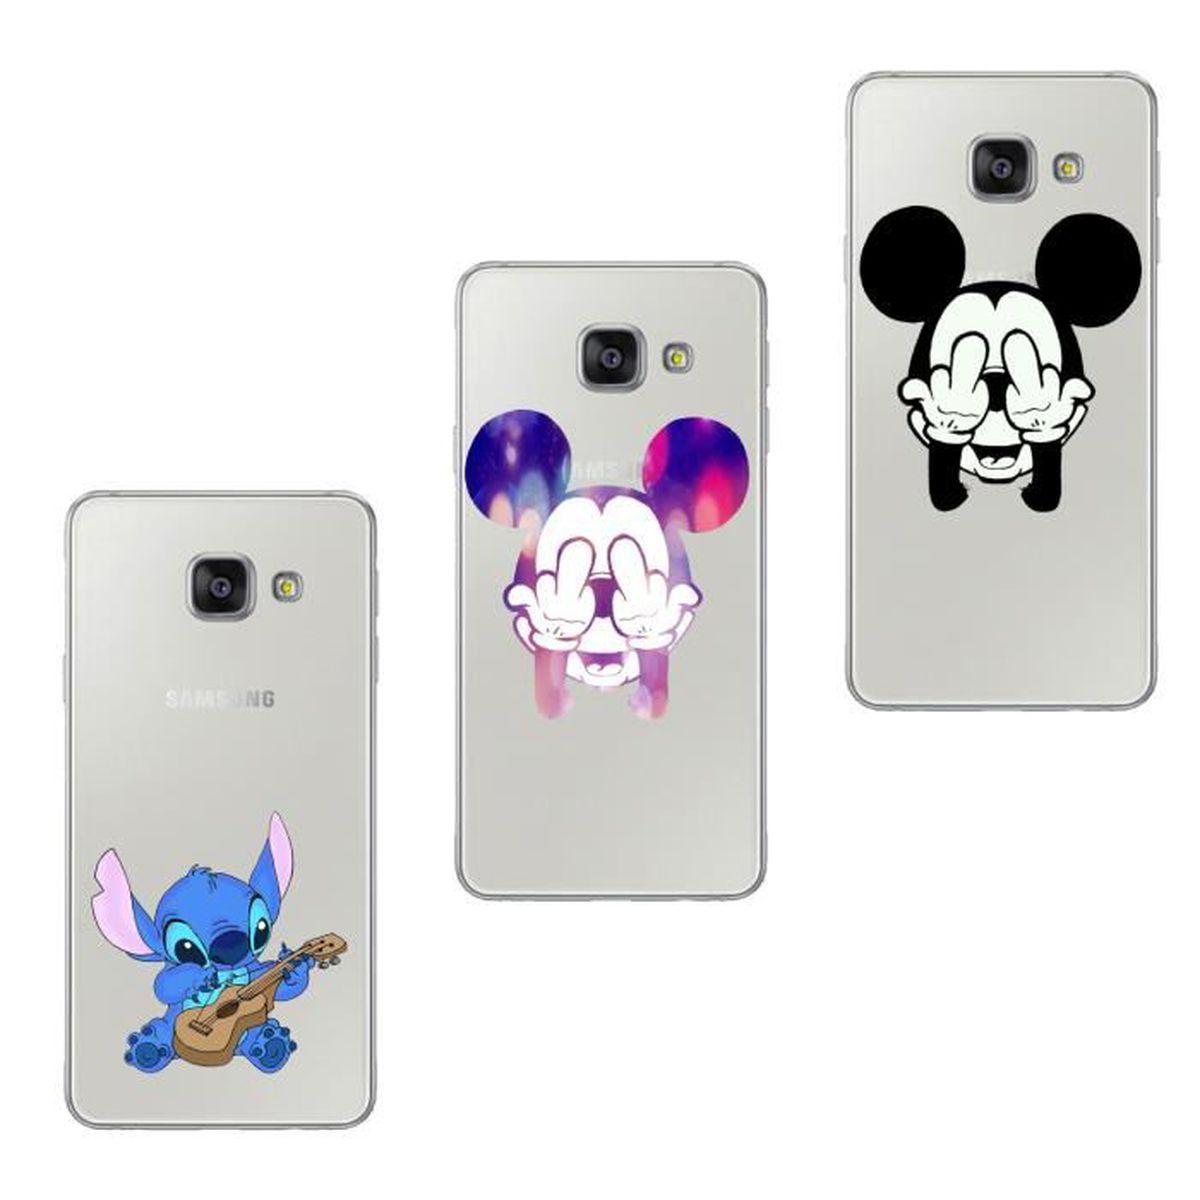 Coque Pour Samsung Galaxy A5 2016 A510 3PC Disney Schéma Souple ...